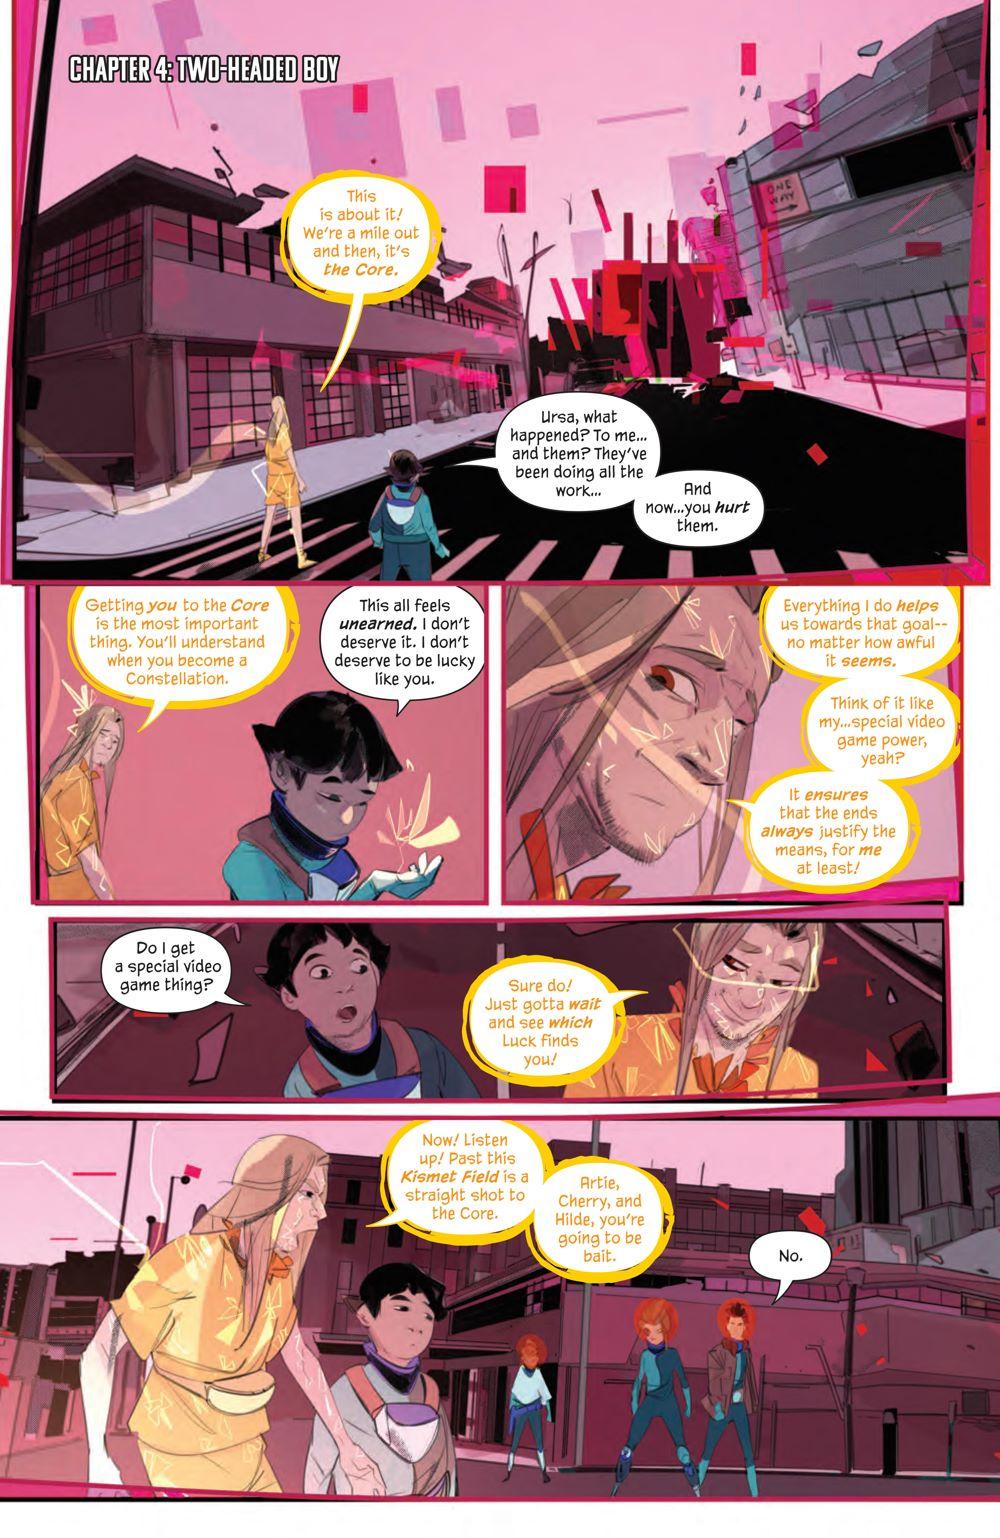 GoodLuck_004_PRESS_5 ComicList Previews: GOOD LUCK #4 (OF 5)